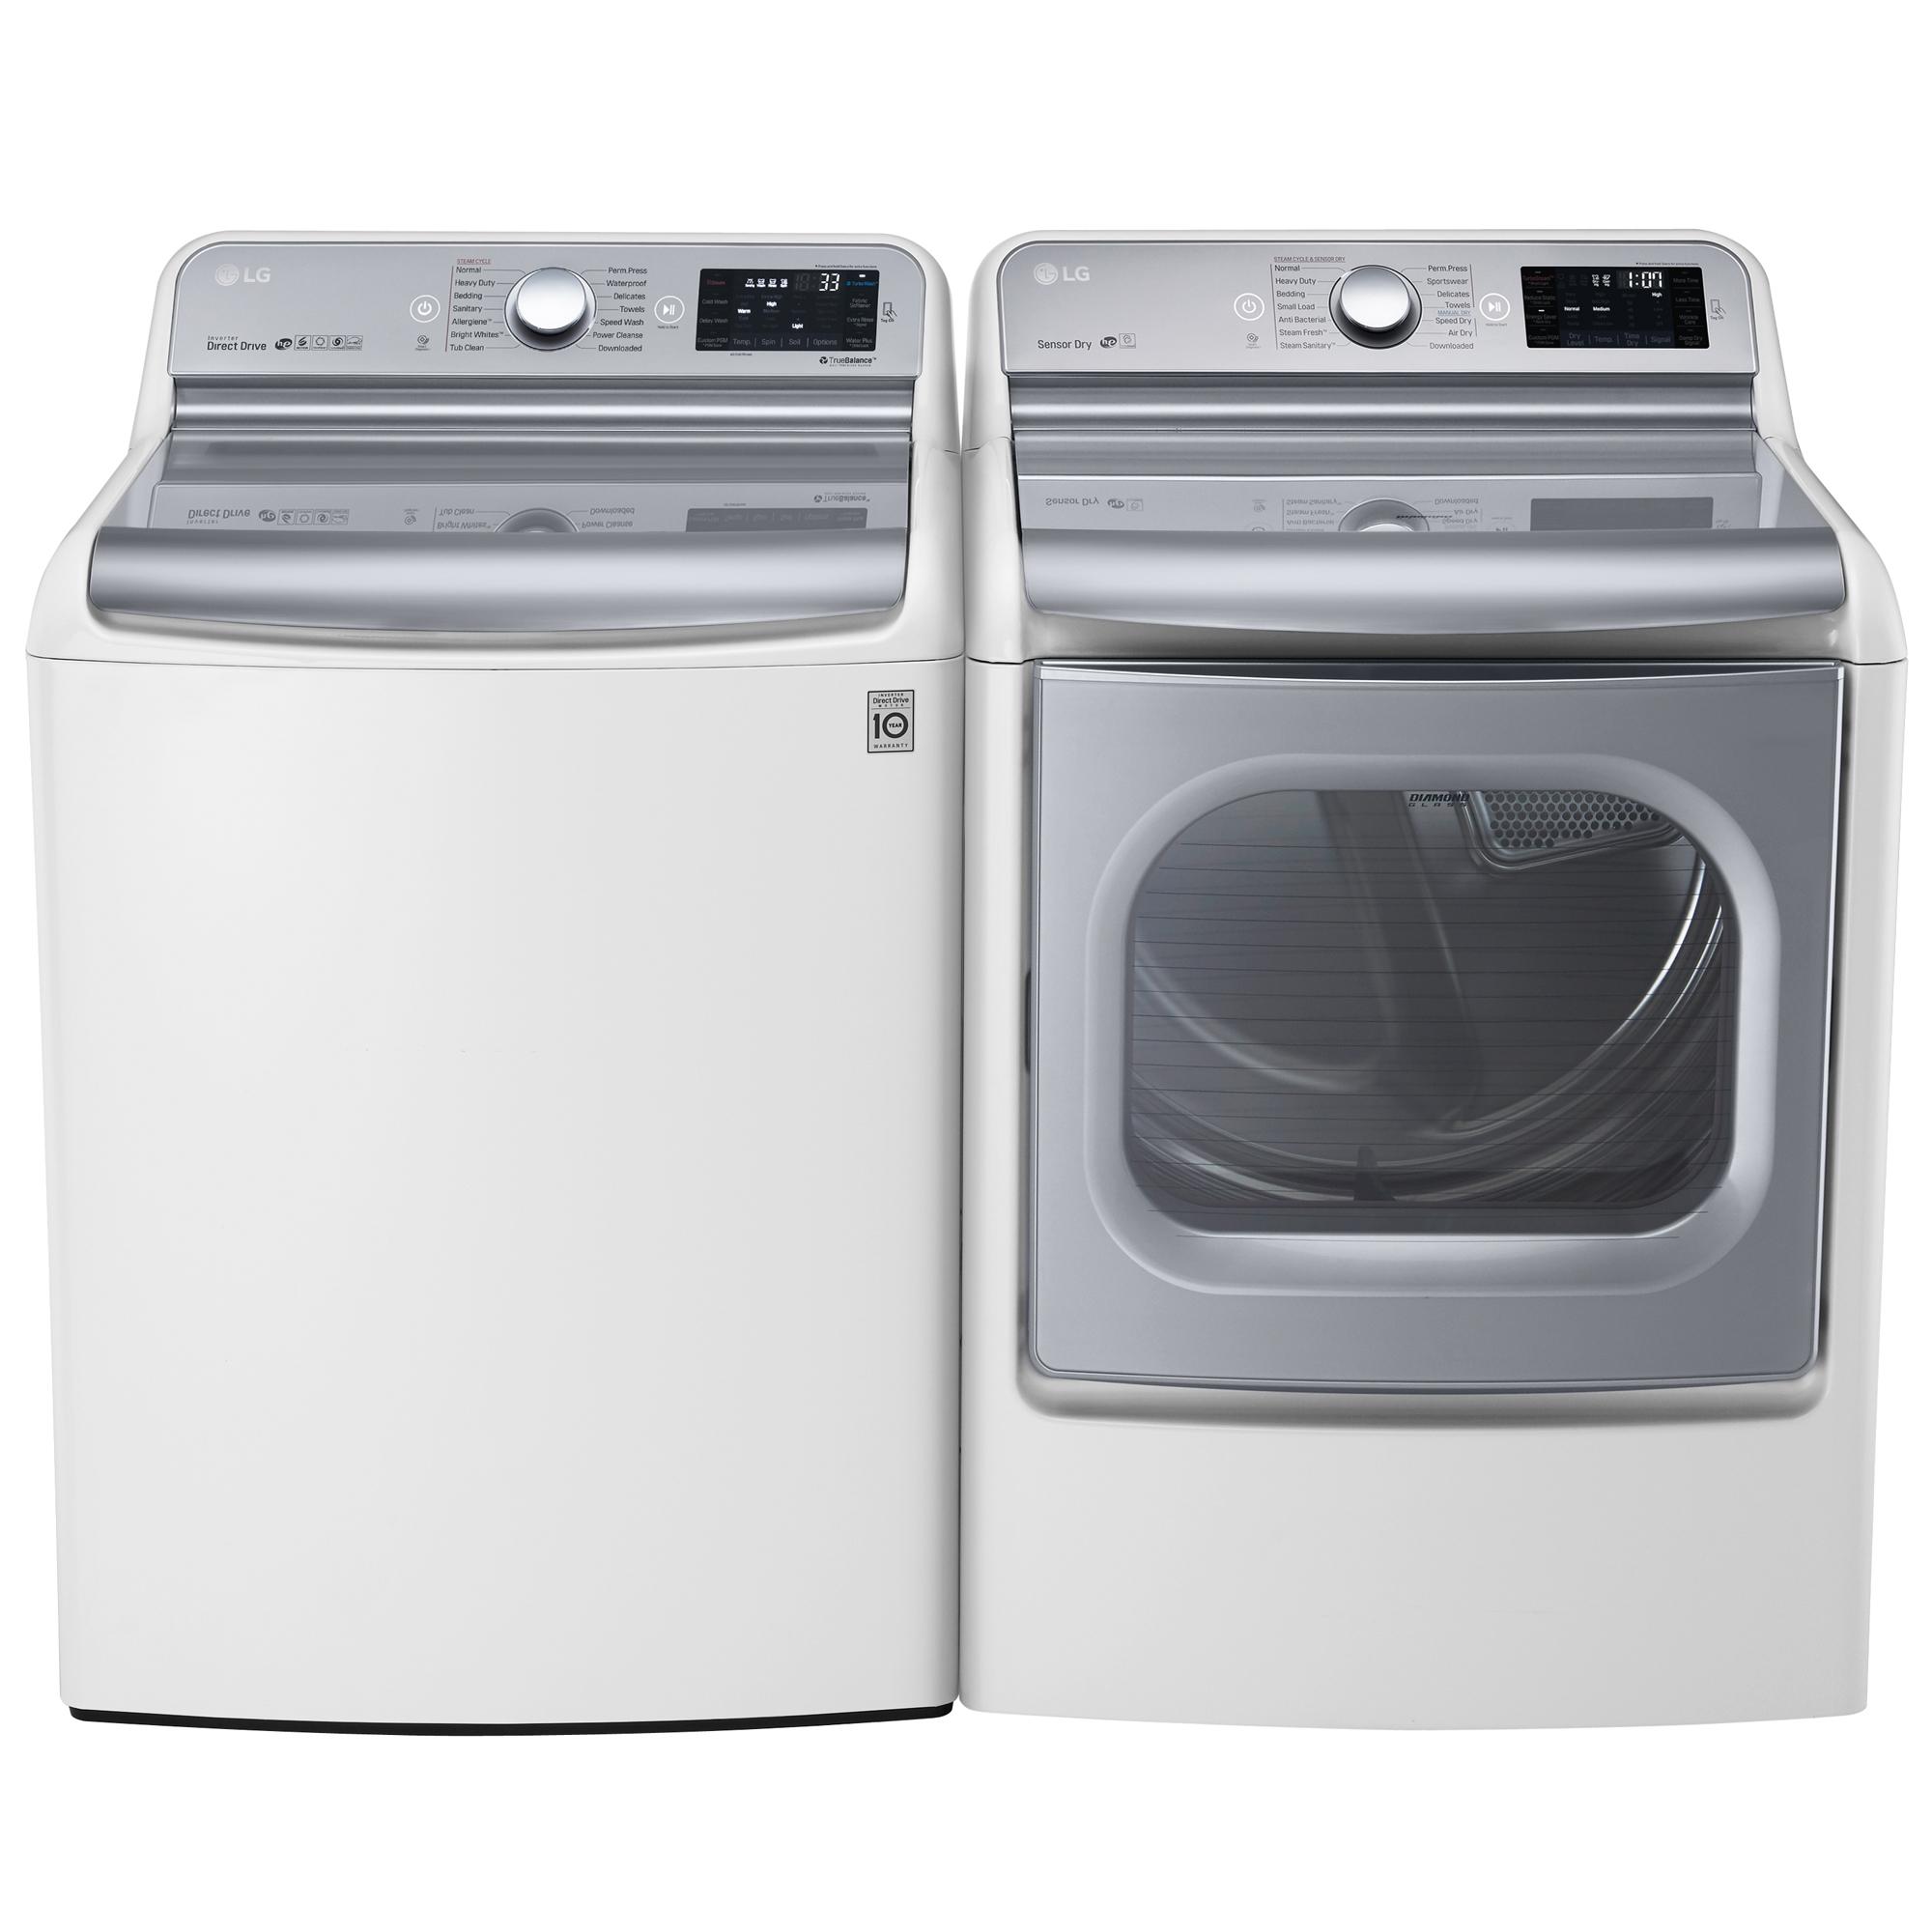 LG WT7700HWA 5.7 cu.ft.. Top Load Washer w/ TurboWash® Technology – White